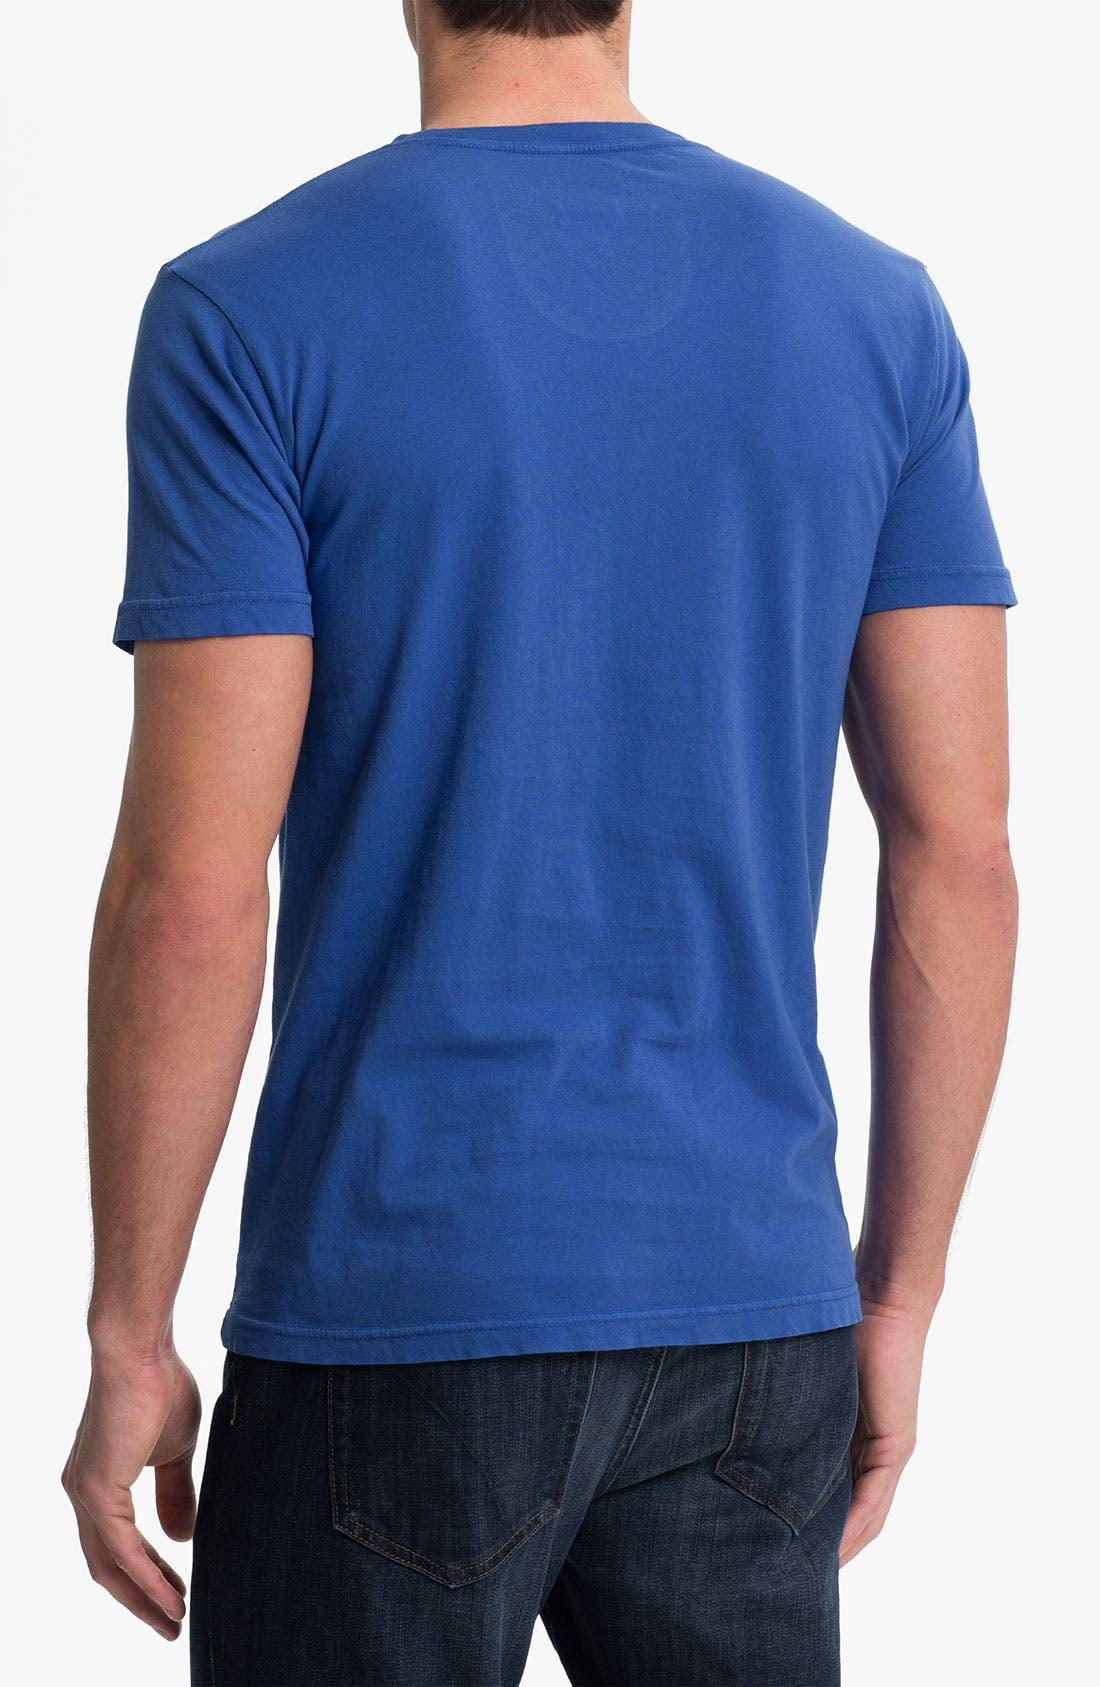 Alternate Image 2  - Denim & Leathers by Andrew Marc 'Bonneville Salt Flats' Graphic T-Shirt